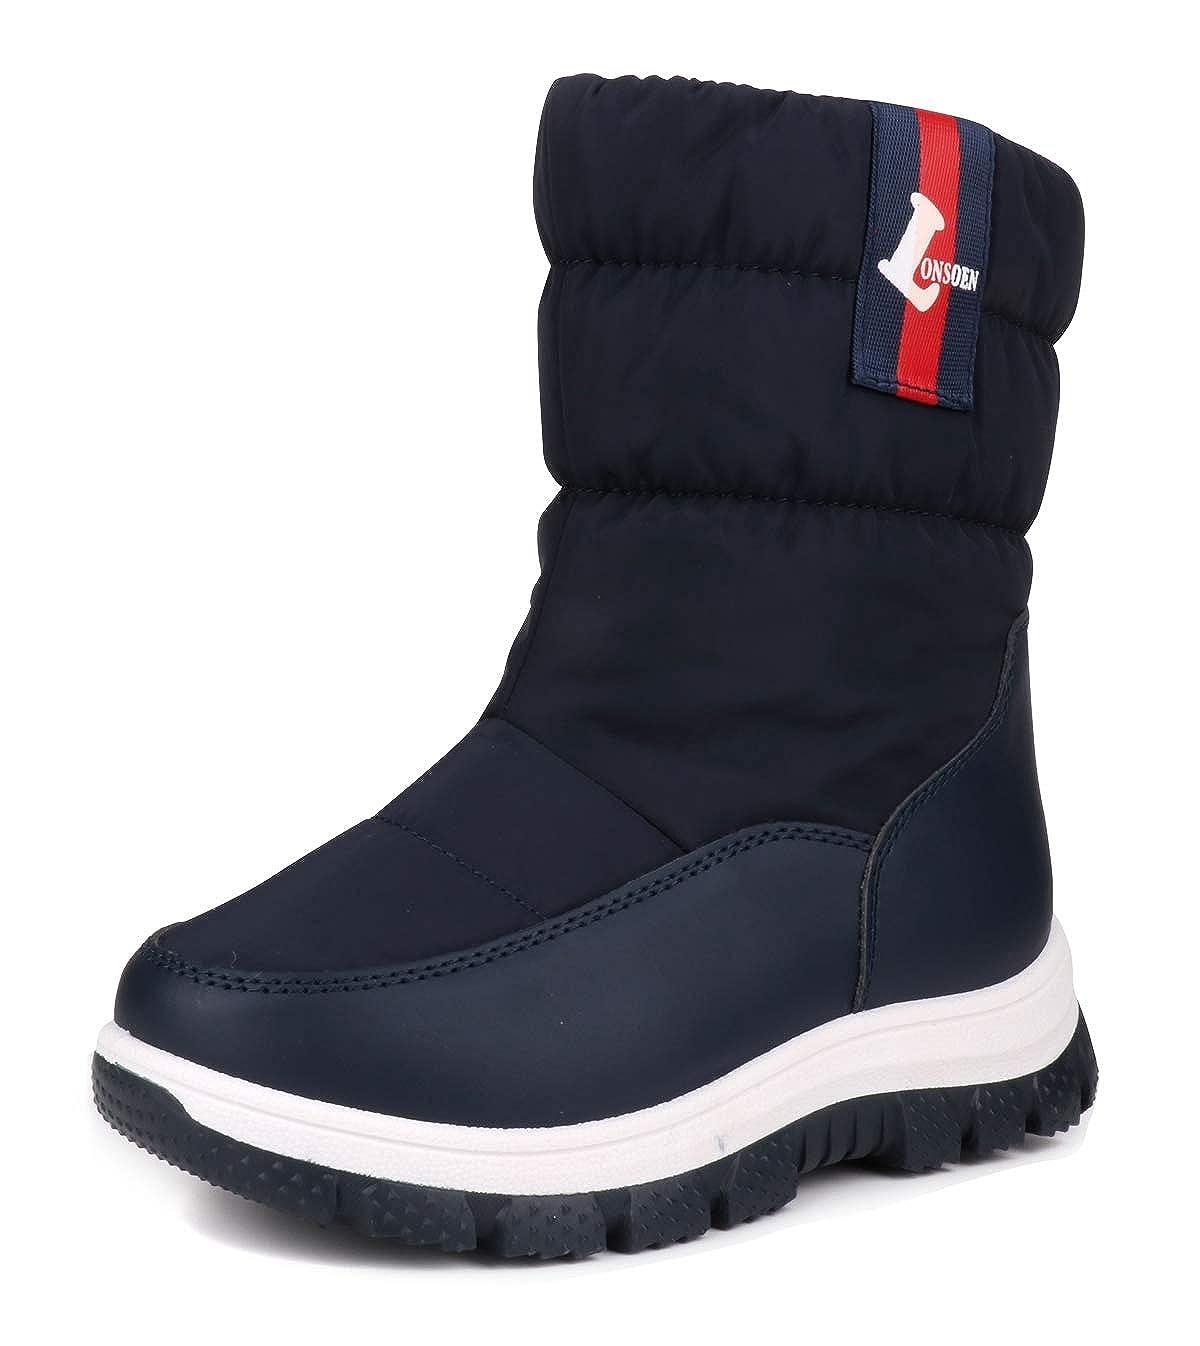 LONSOEN Kids Boys Girls Frosty Winter Snow Boots Fur Lined Warm Anti-Slip Mid Calf Boots